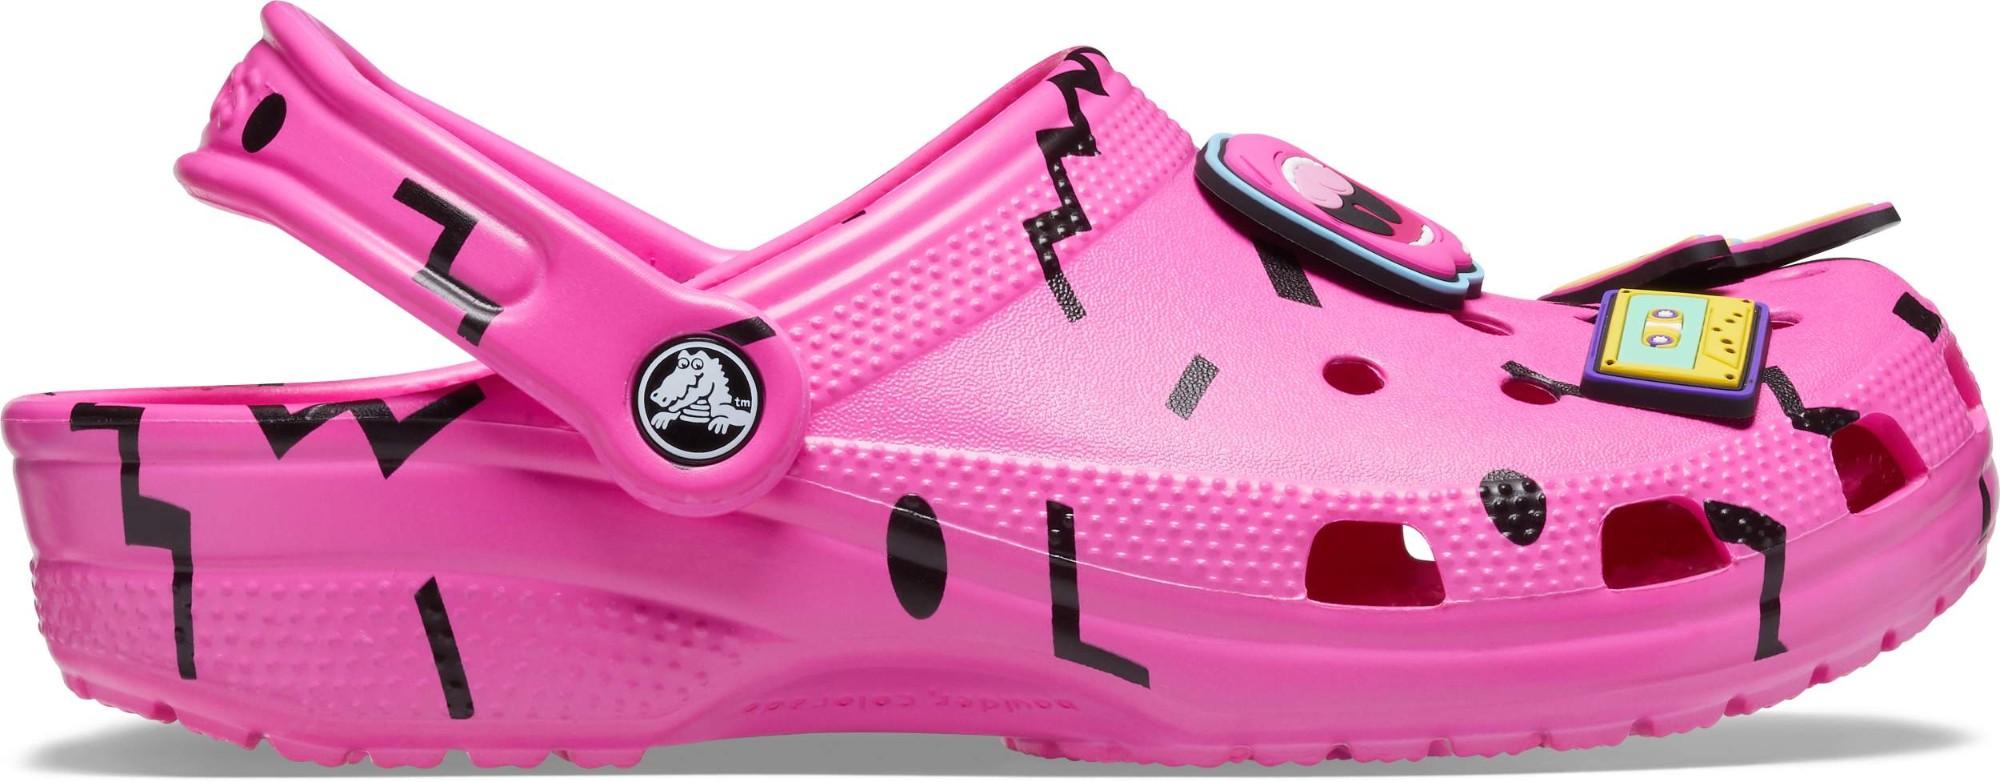 Crocs™ Classic 90s Clog Electric Pink/Black 39,5